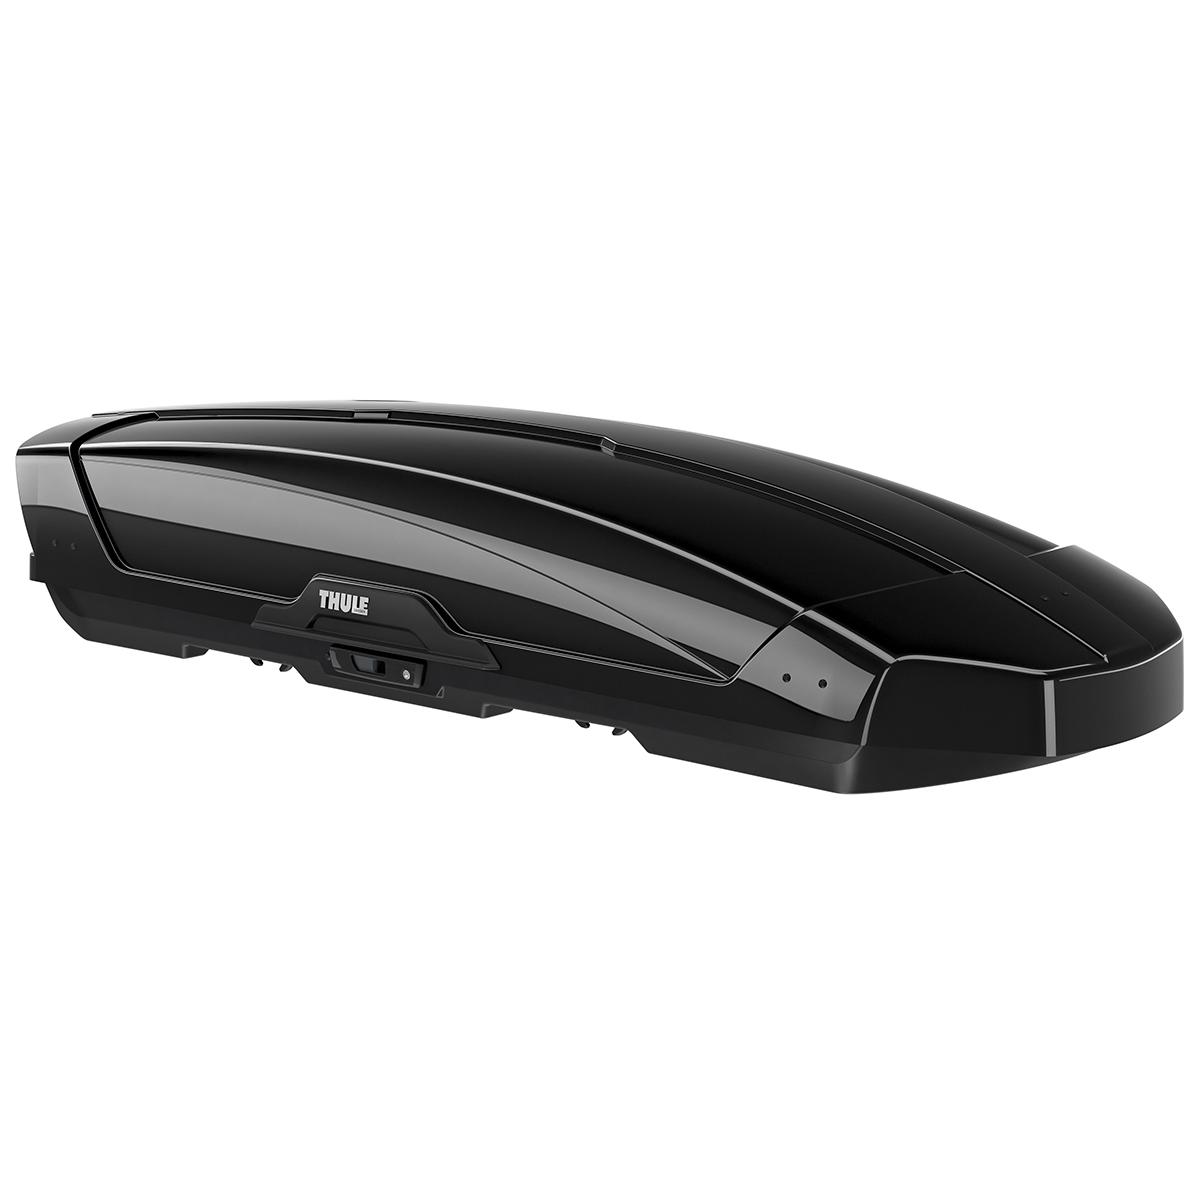 Thule Motion XT XXL 6299B (Black Glossy) Roof Box